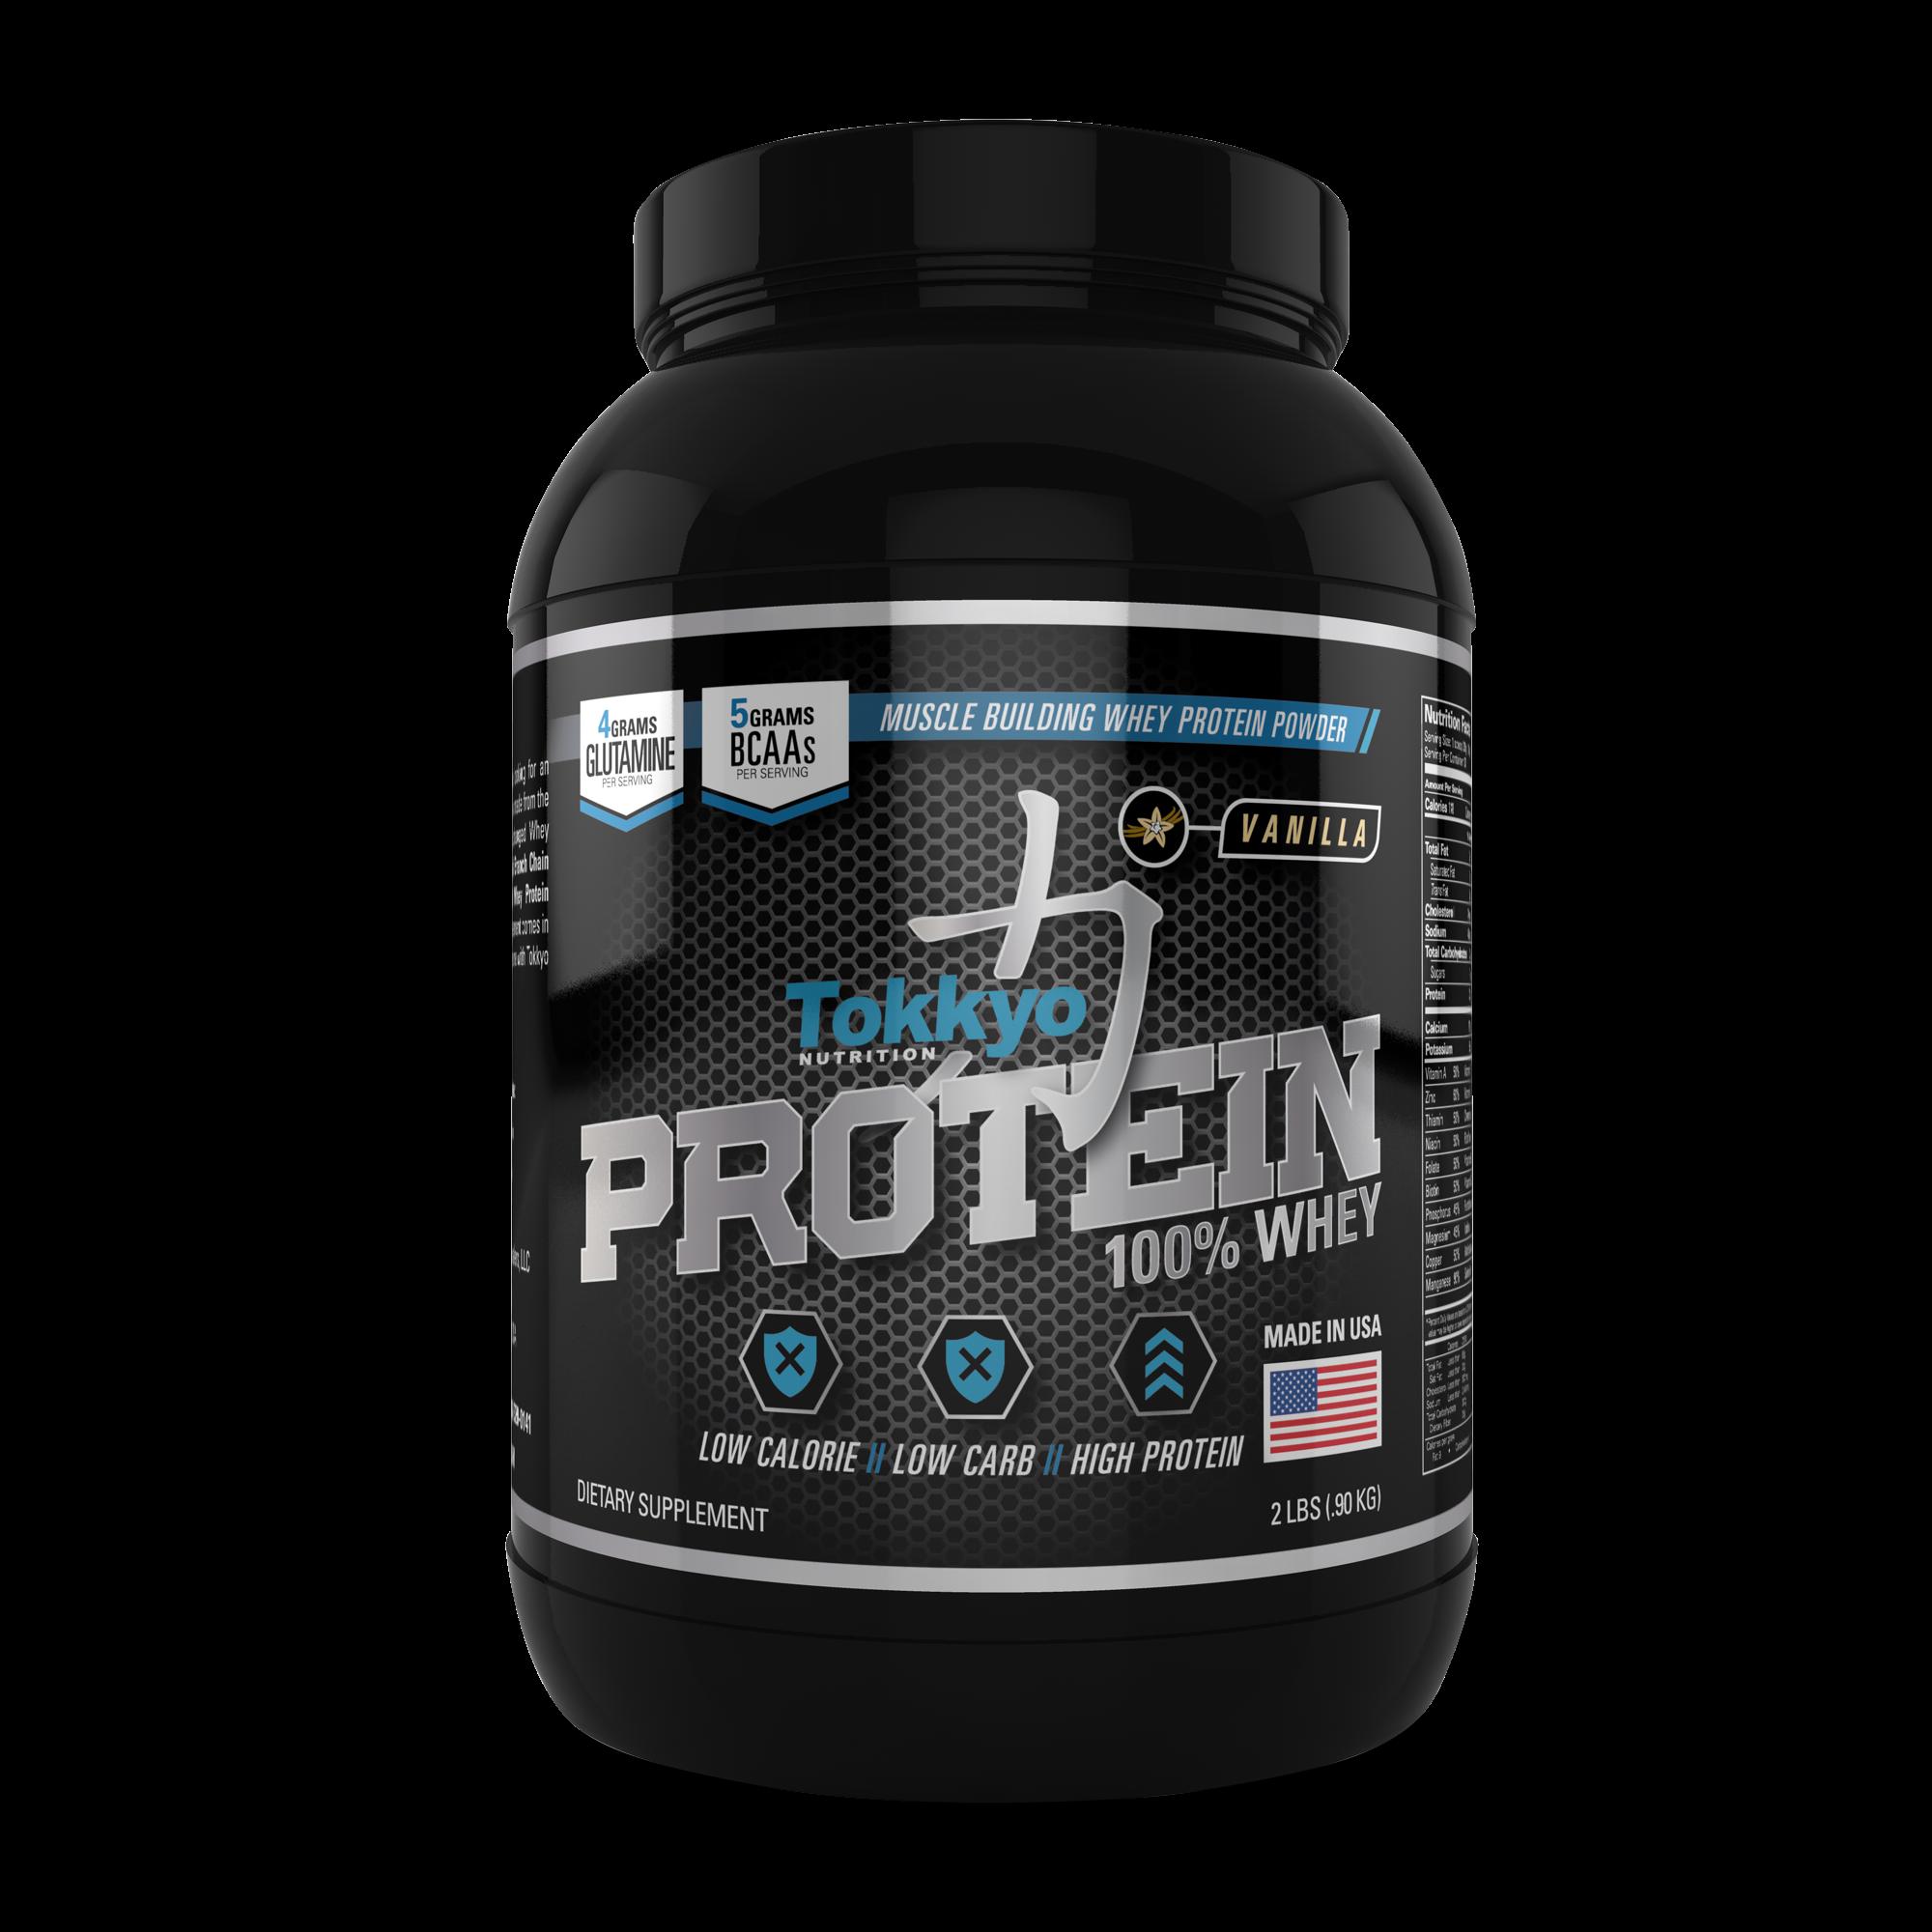 Nitrous Stack Tokkyo Nutrition: Whey Protein: The Underutilized Supplement